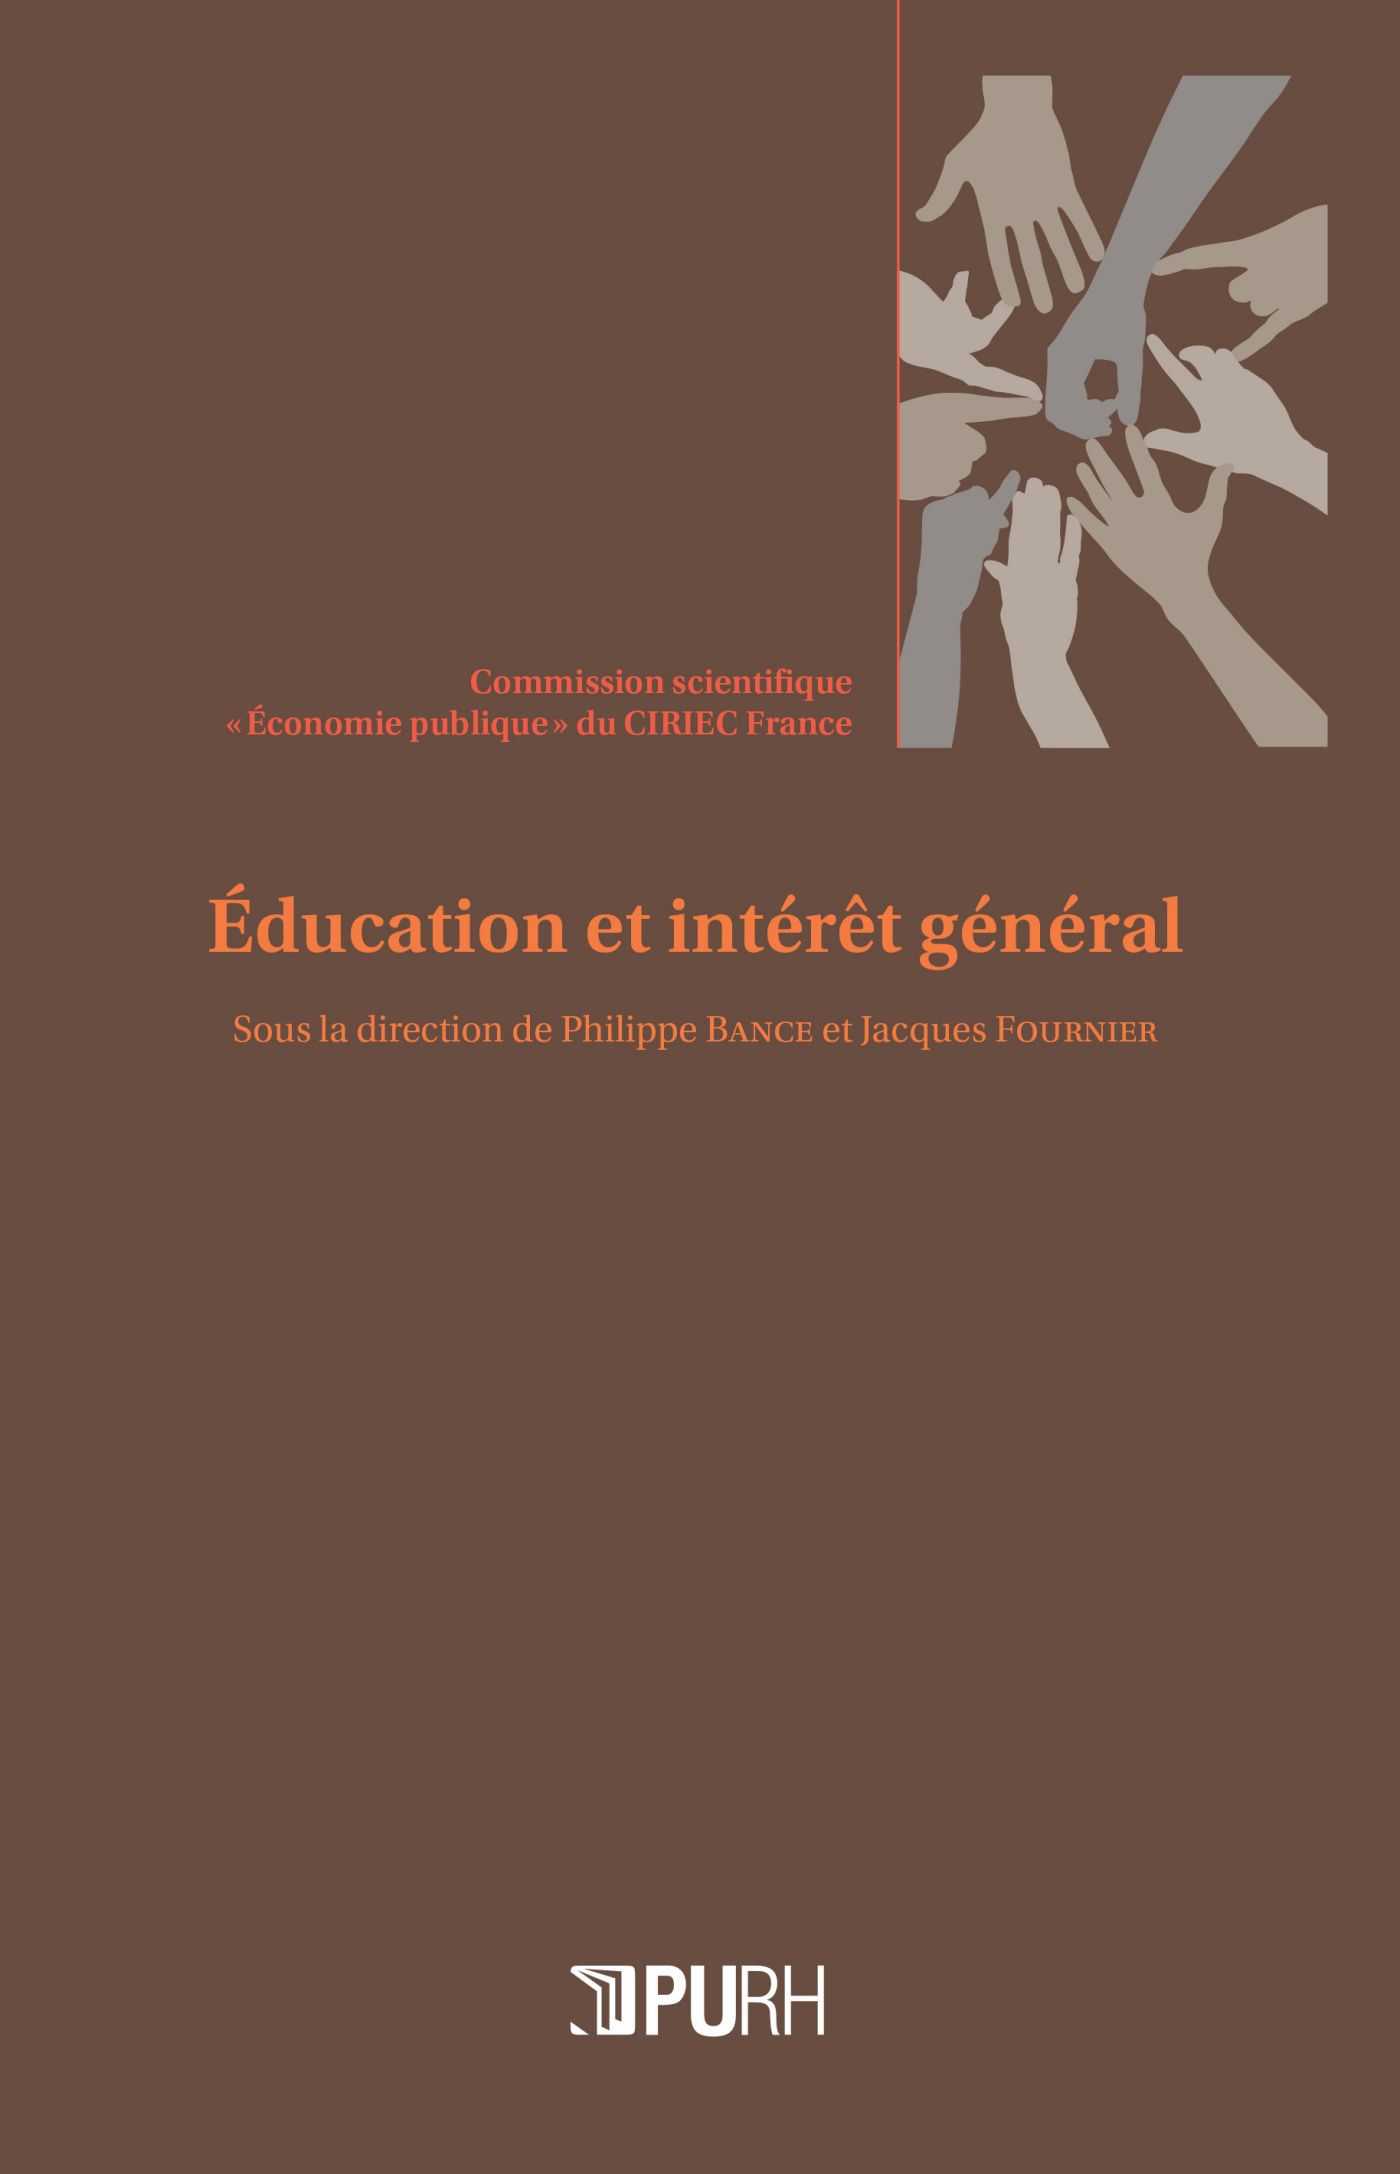 EDUCATION ET INTERET GENERAL